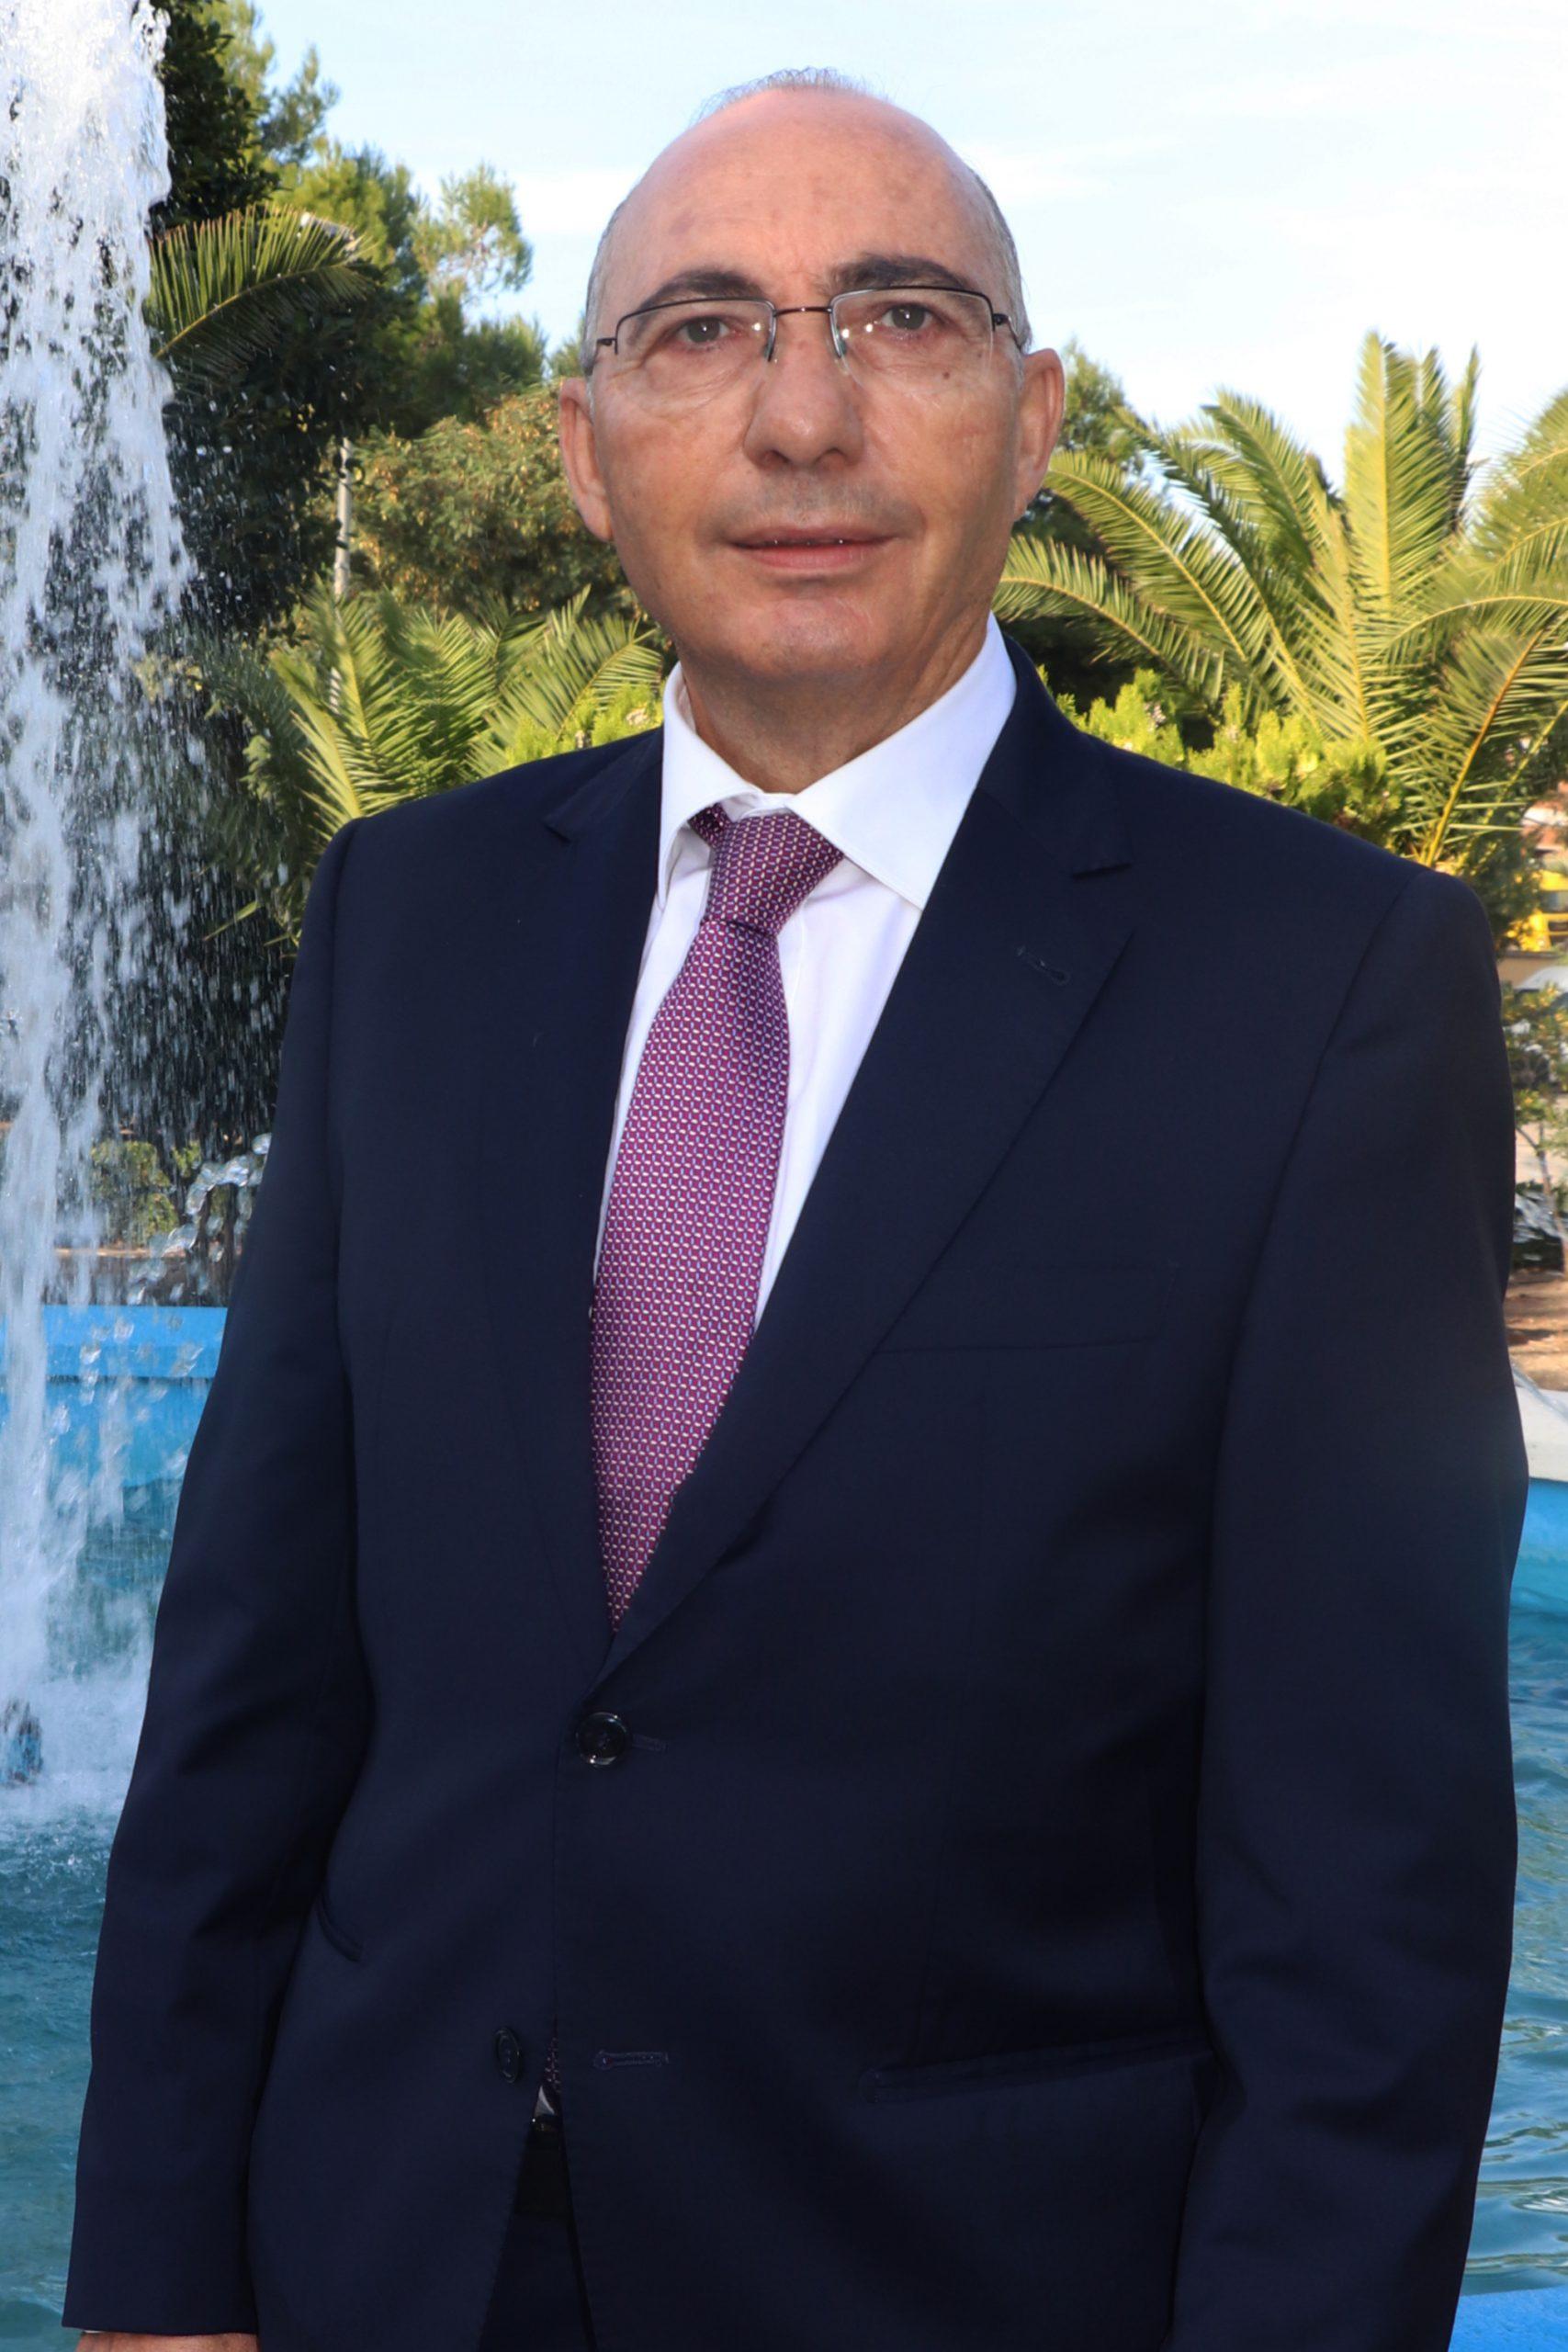 D. Fermín Sánchez Navarro, D. Javier Moreno Jimeno